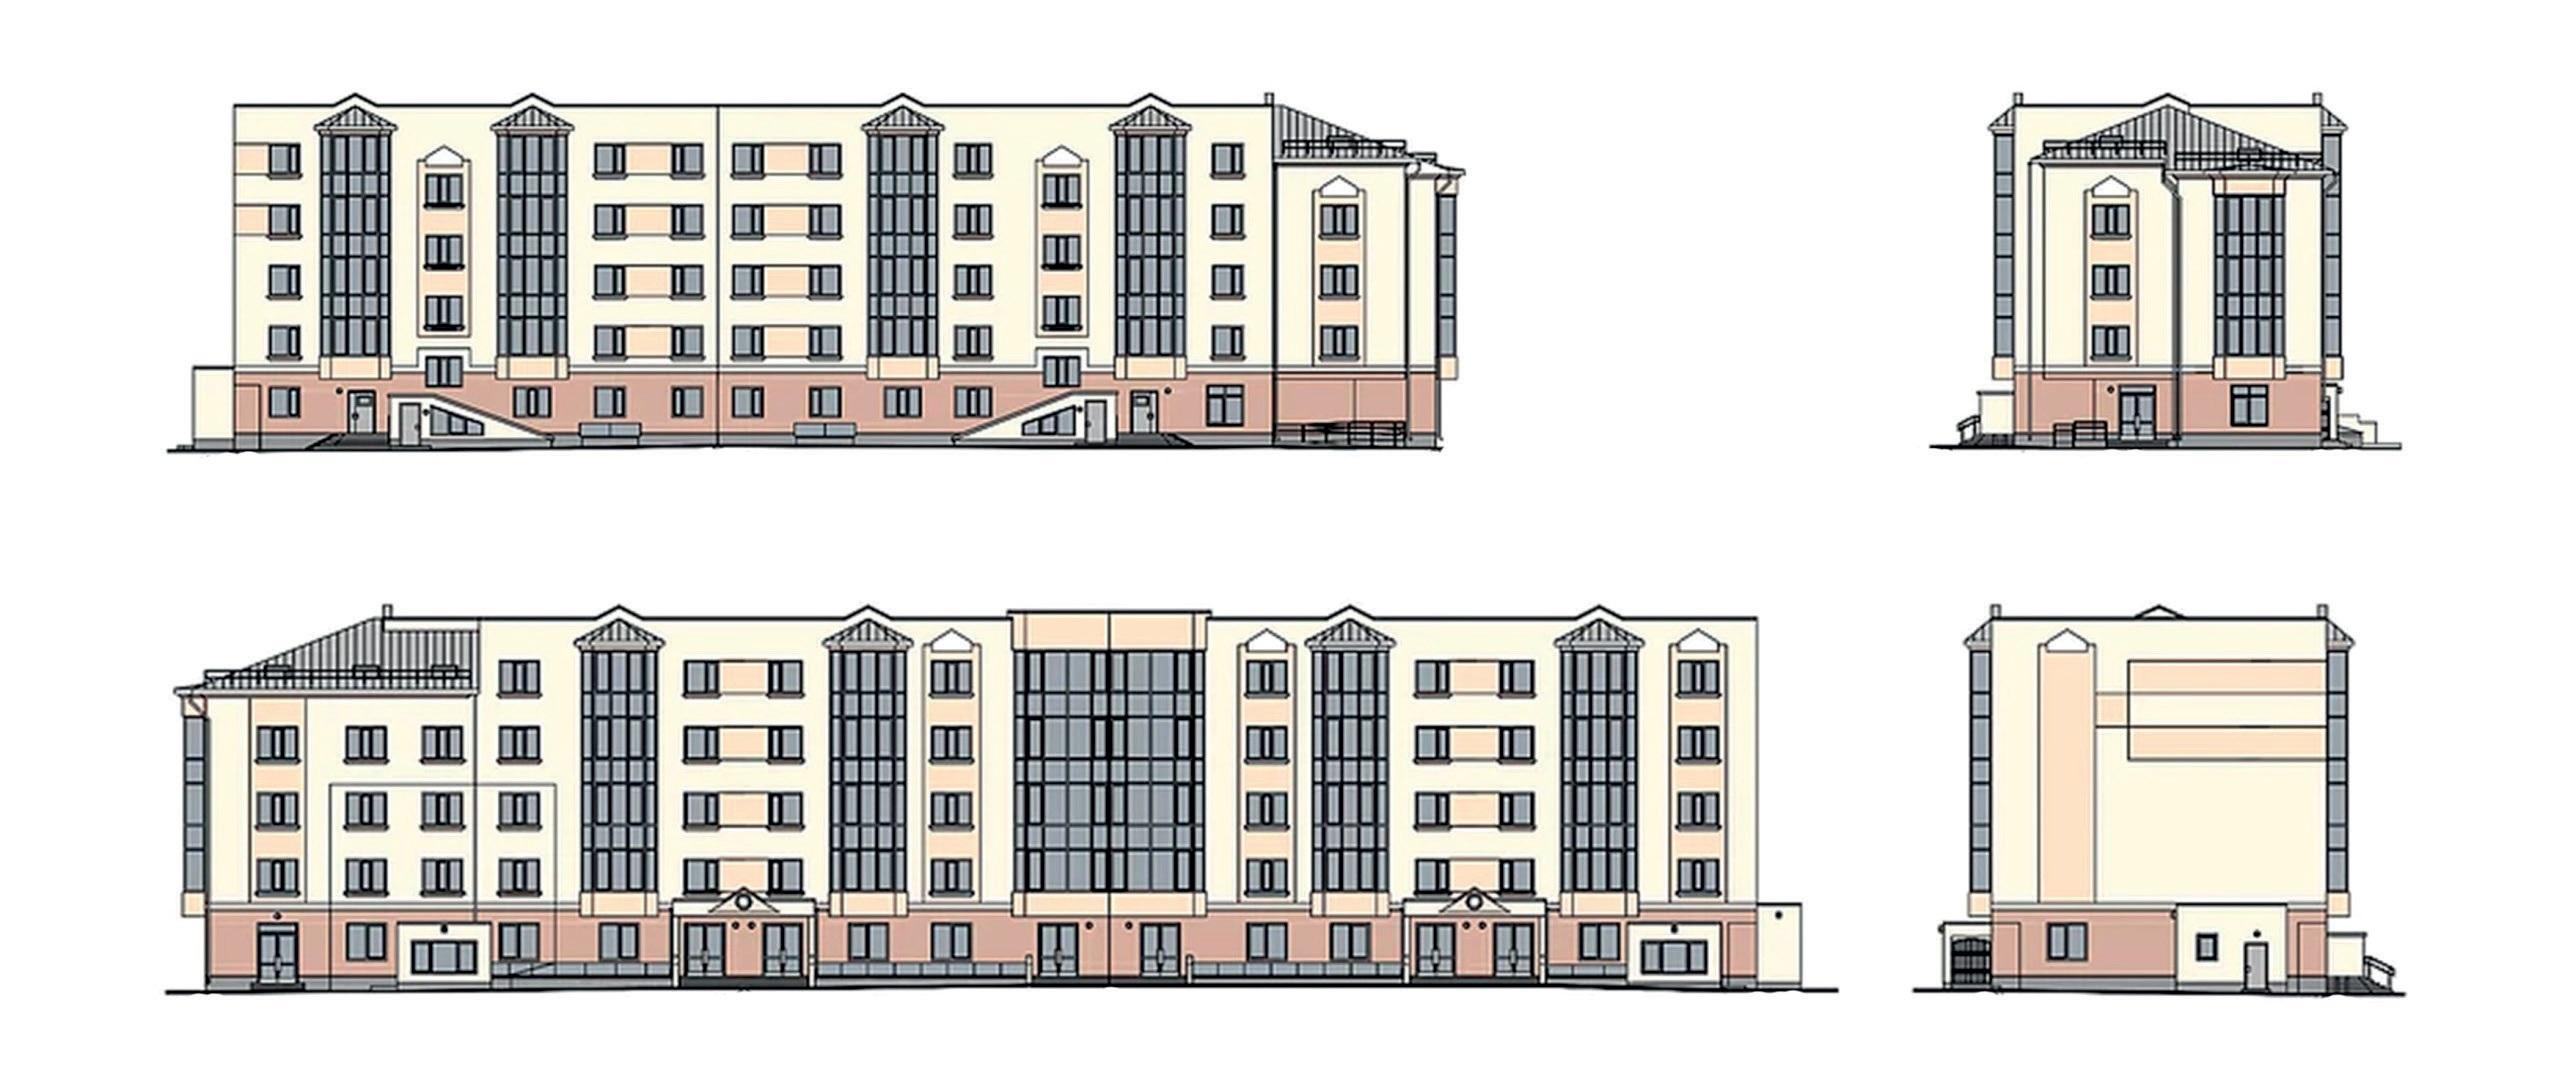 Однокомнатная квартира - ул.Петровская, д. 4б, кв.11